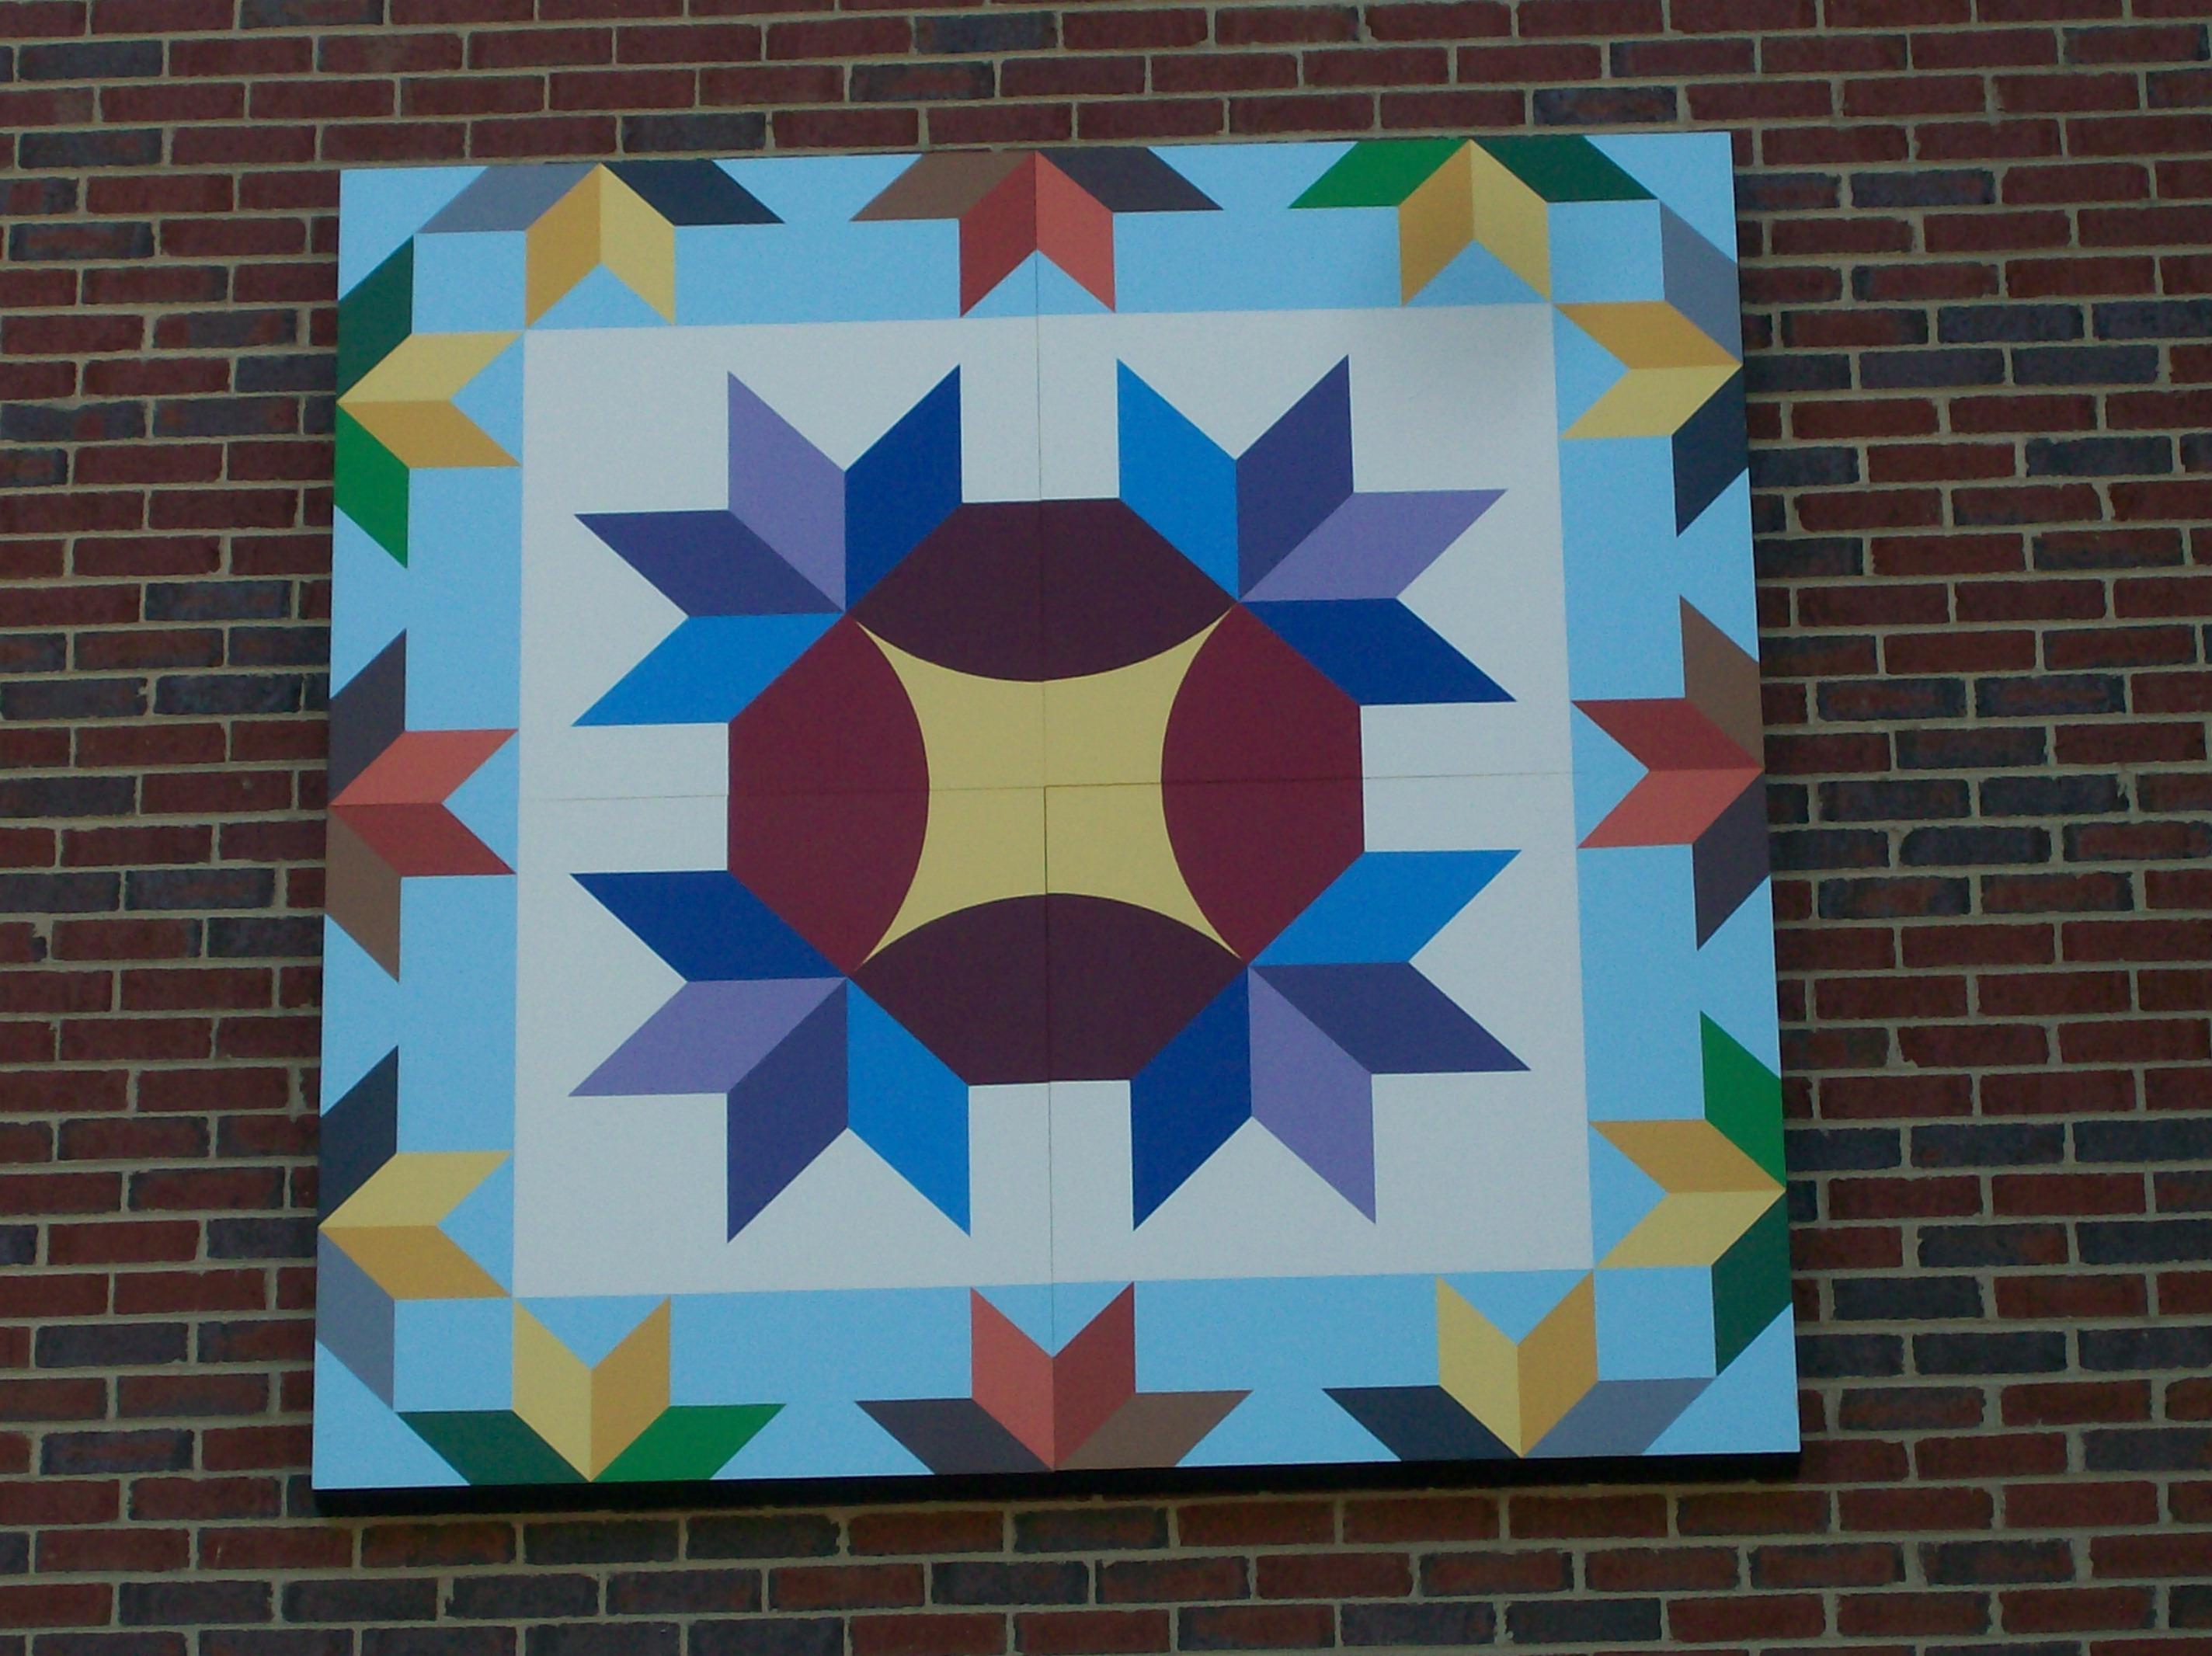 Quilt Block Installed On Marion Elementary School Hands